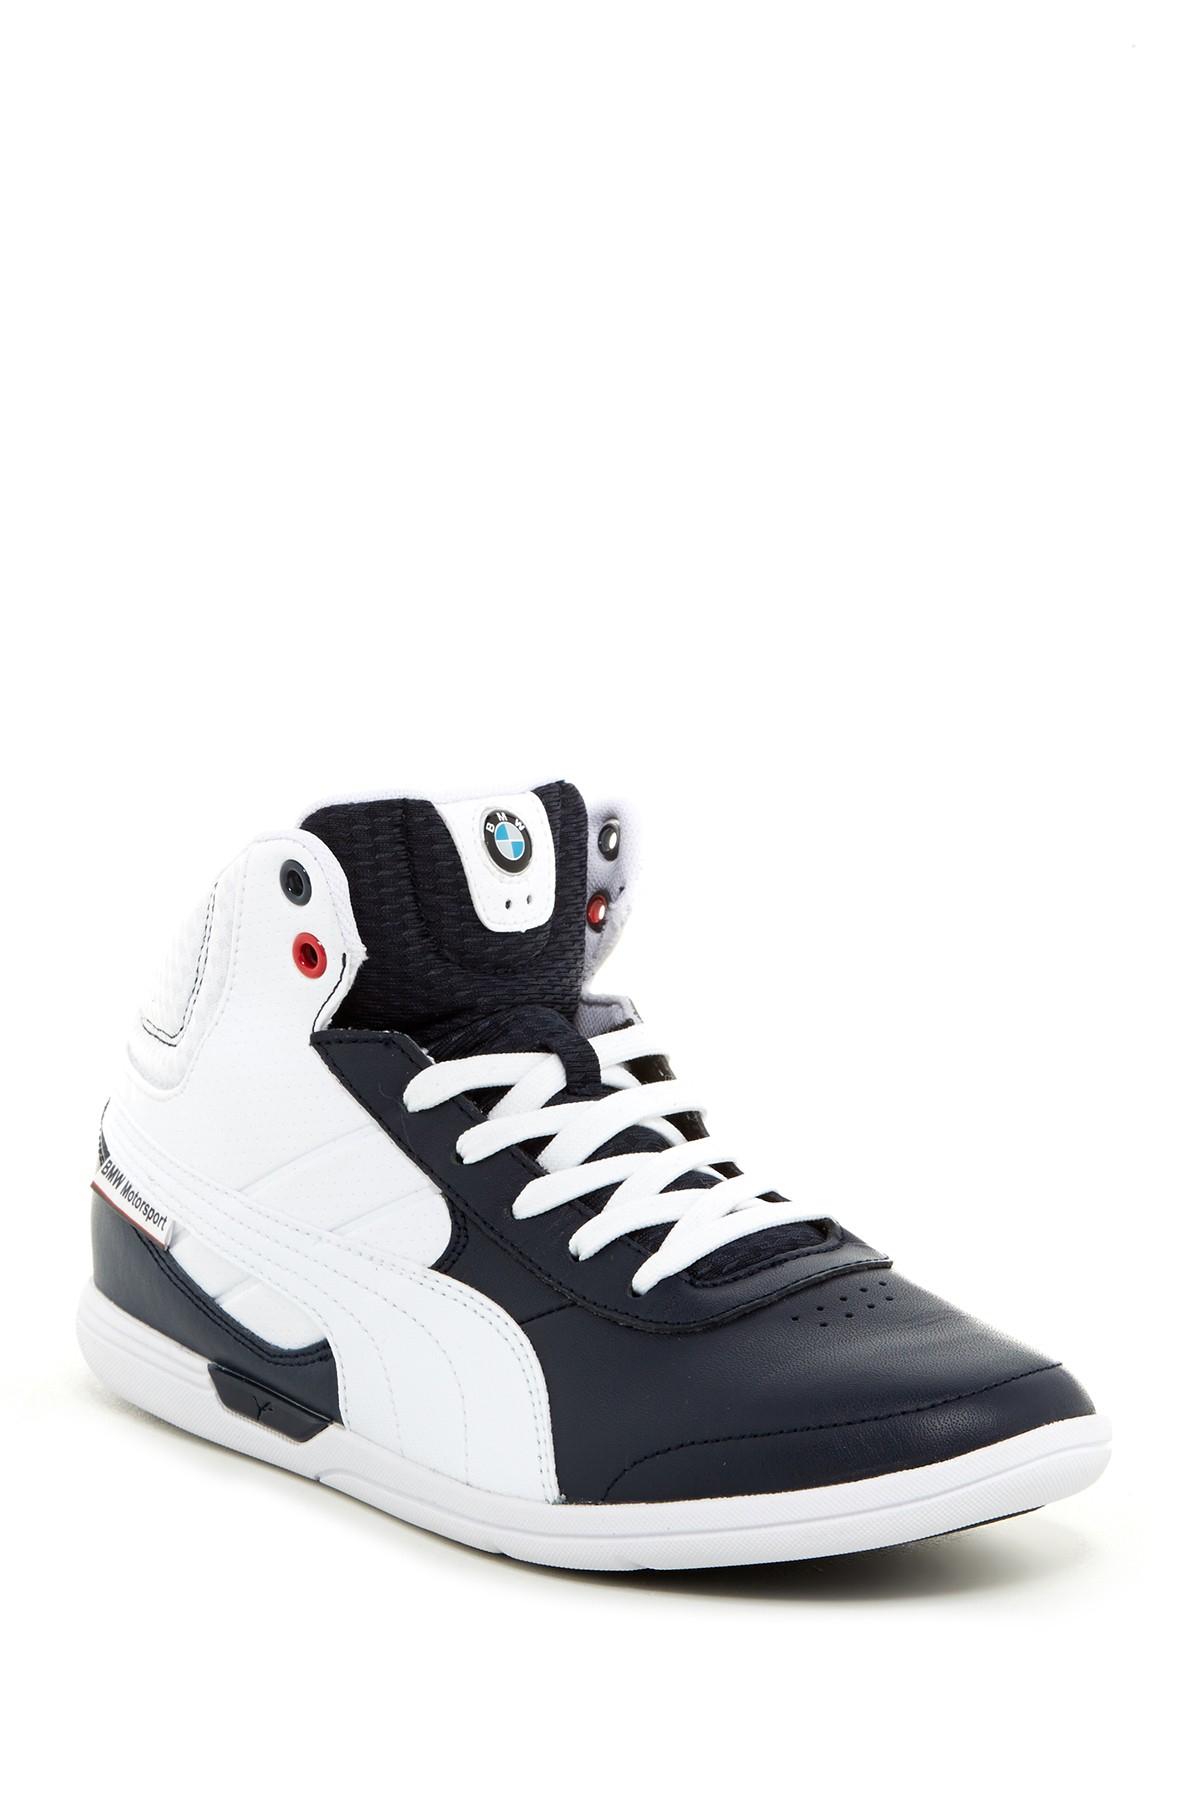 puma bmw mid sneaker in white for men lyst. Black Bedroom Furniture Sets. Home Design Ideas